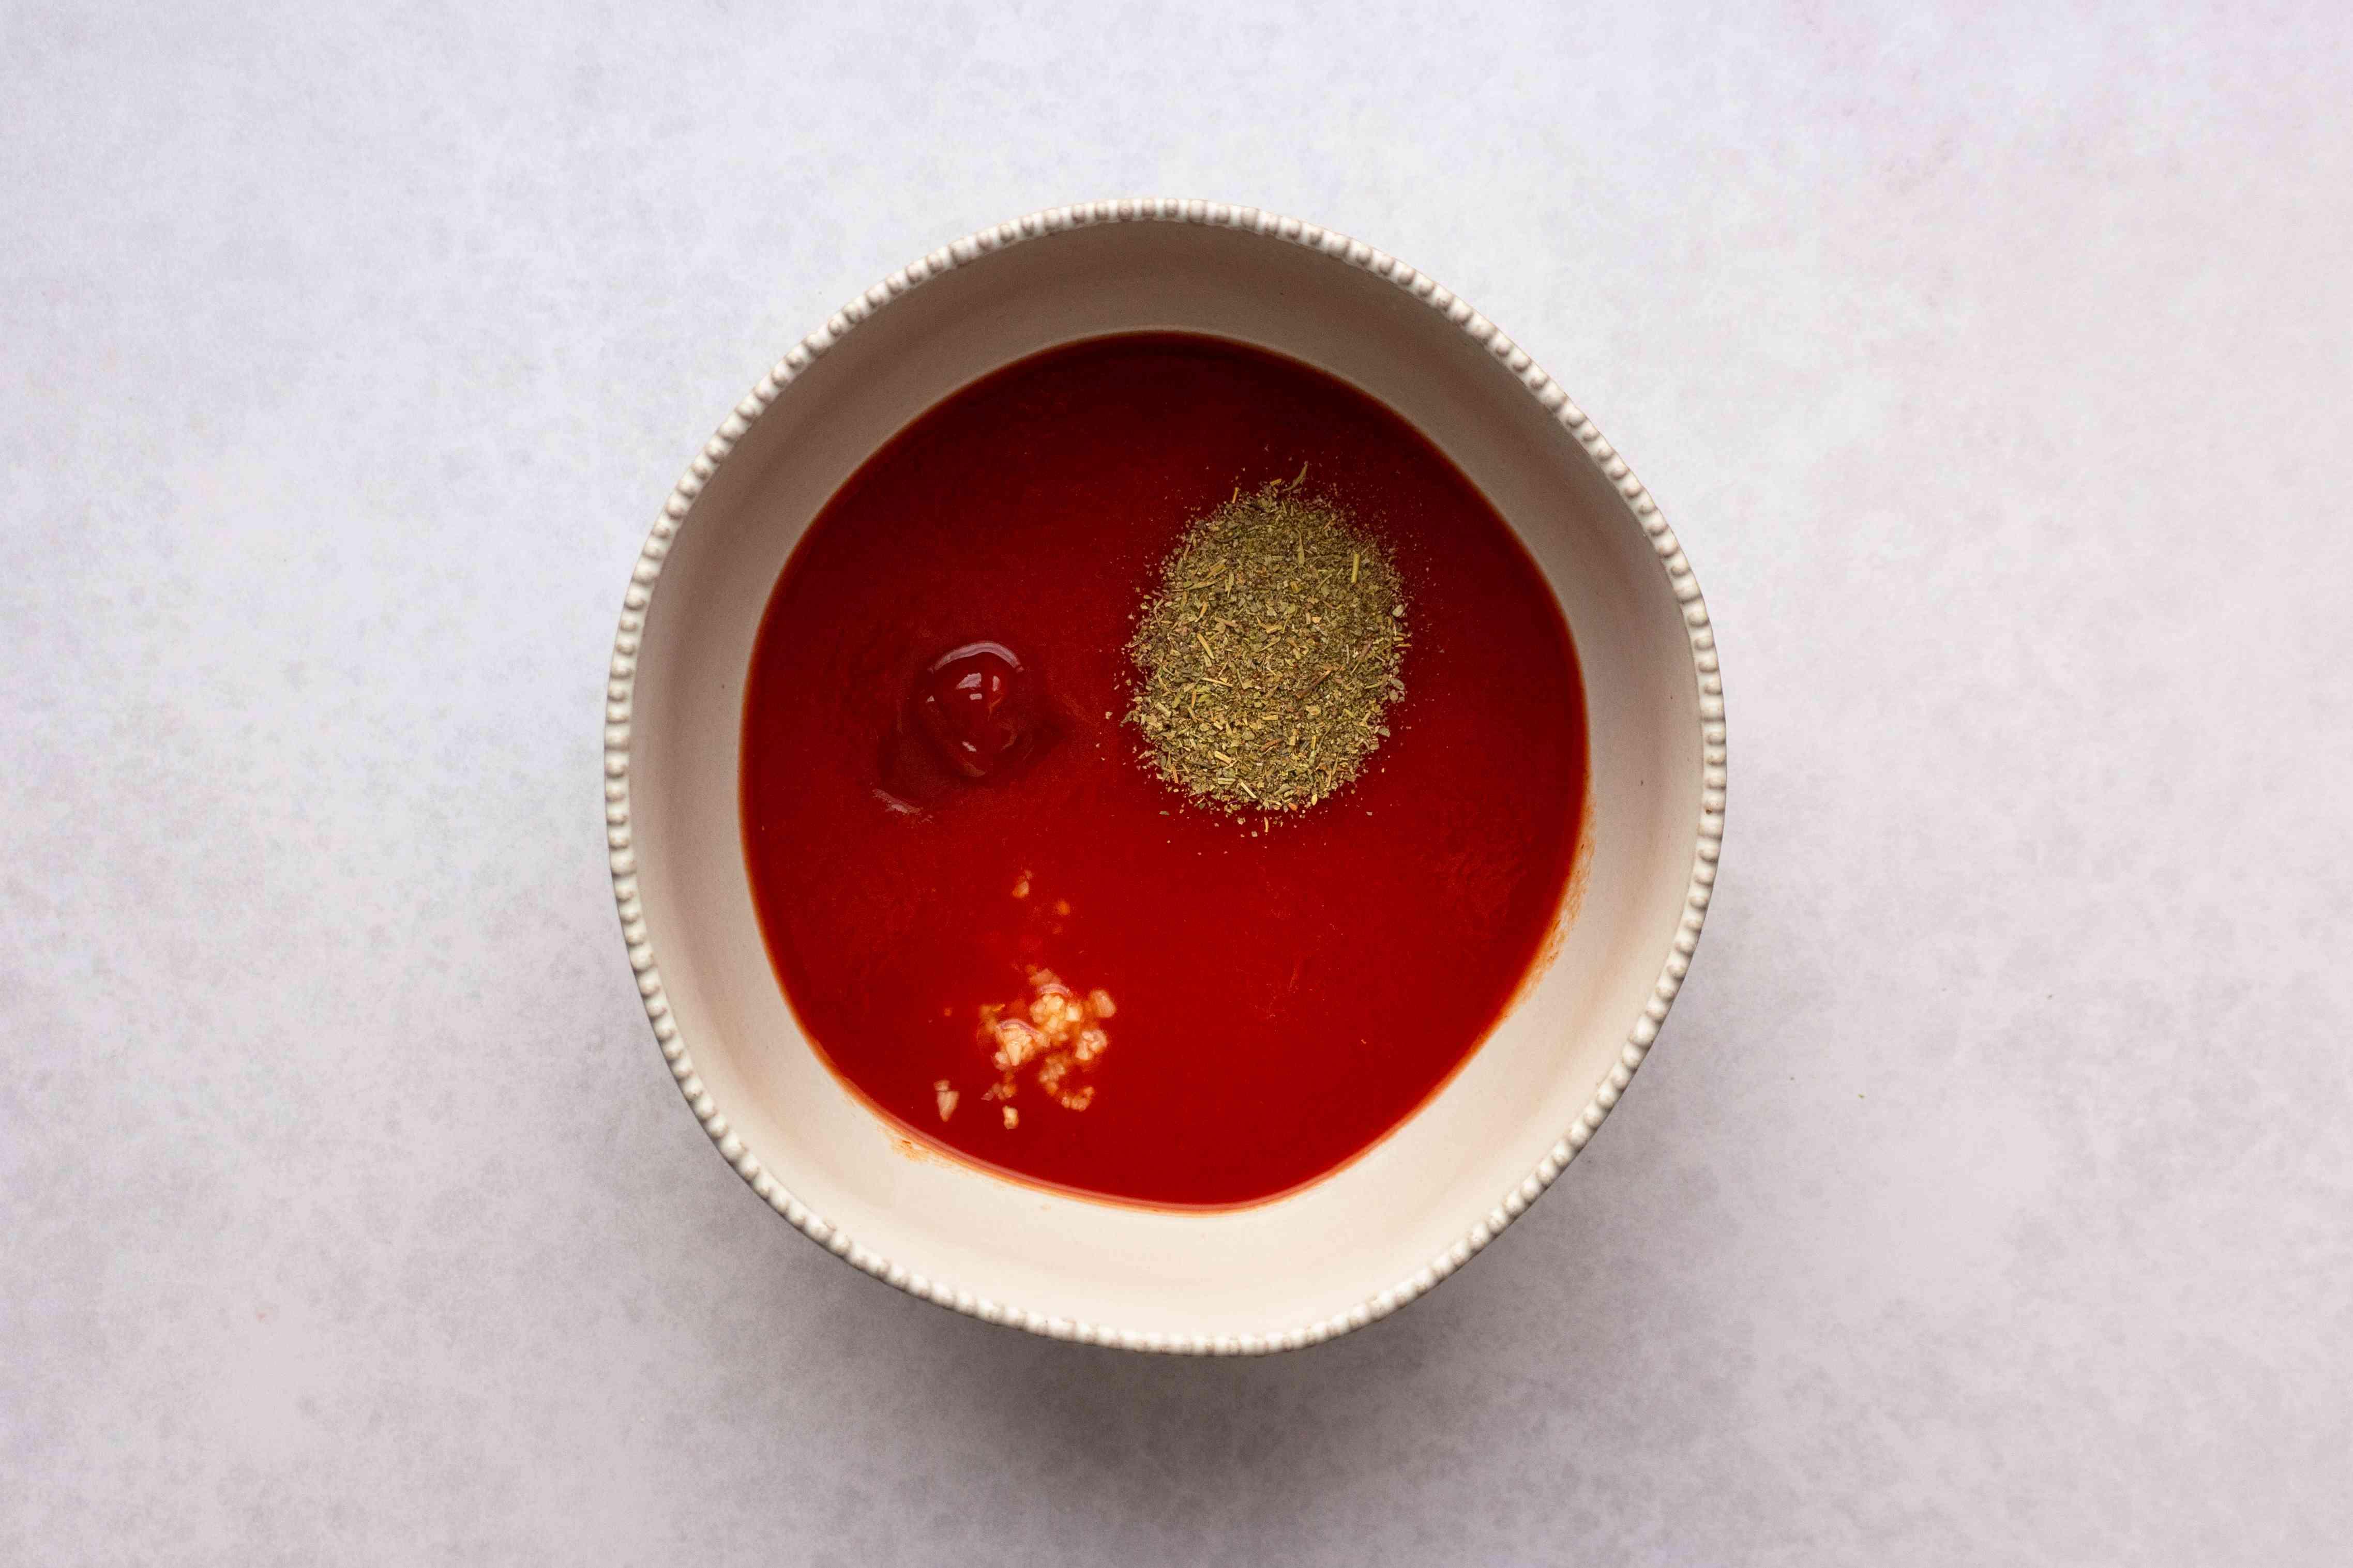 tomato juice, ketchup, minced garlic, Italian seasoning and salt in a bowl